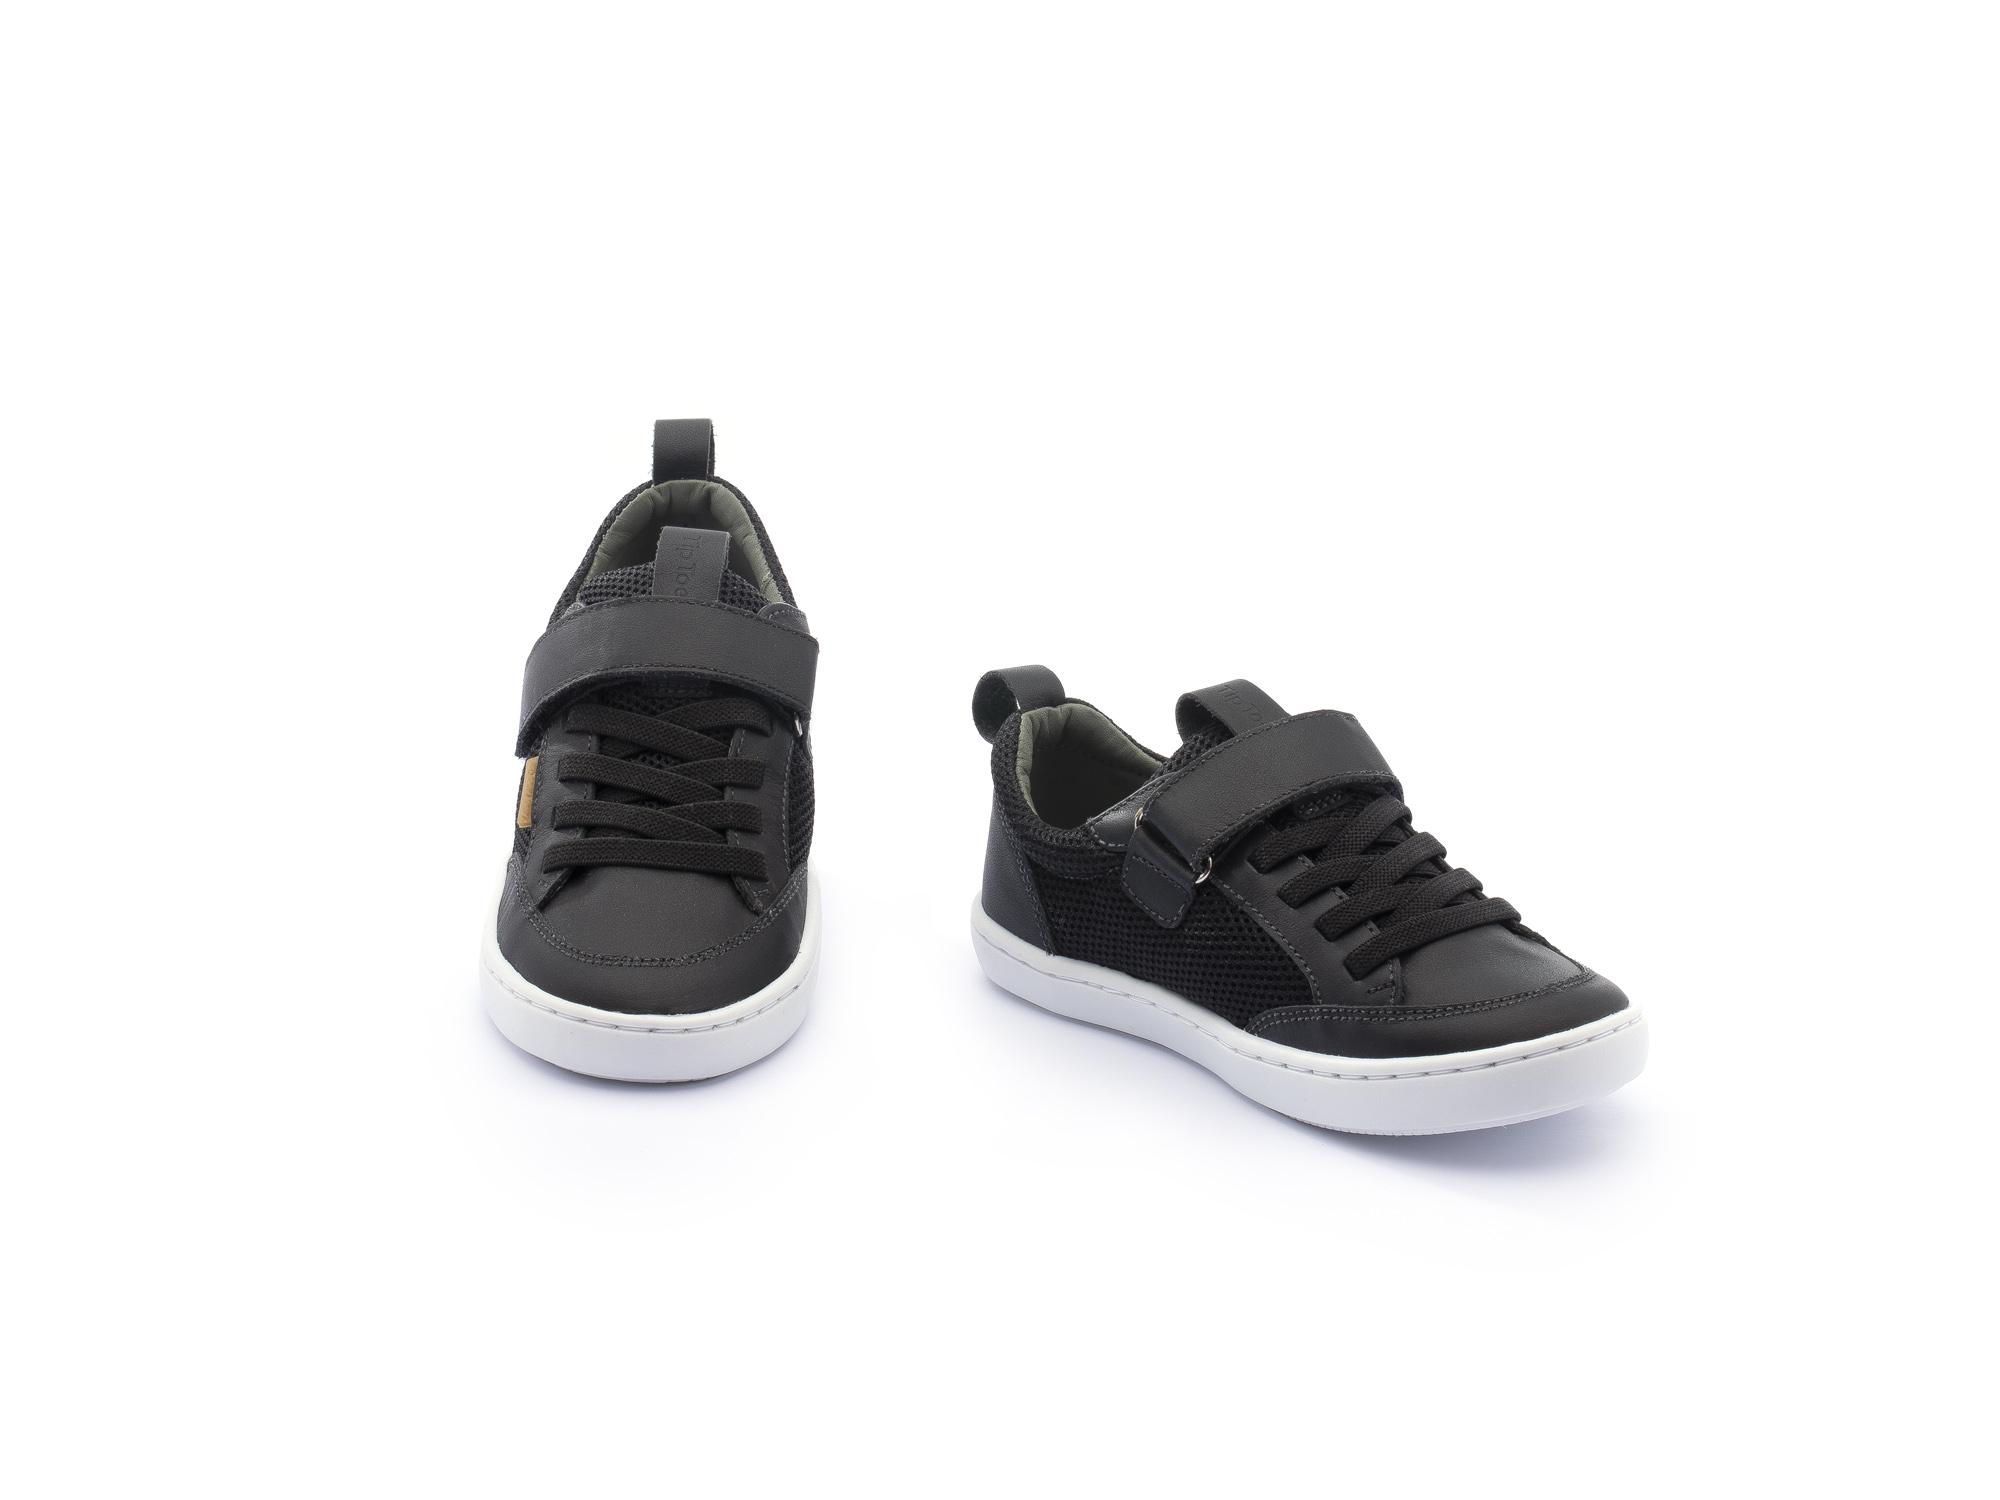 Sneaker Casual Little Urban Mesh Black/ Black Toddler 2 à 4 anos - 2